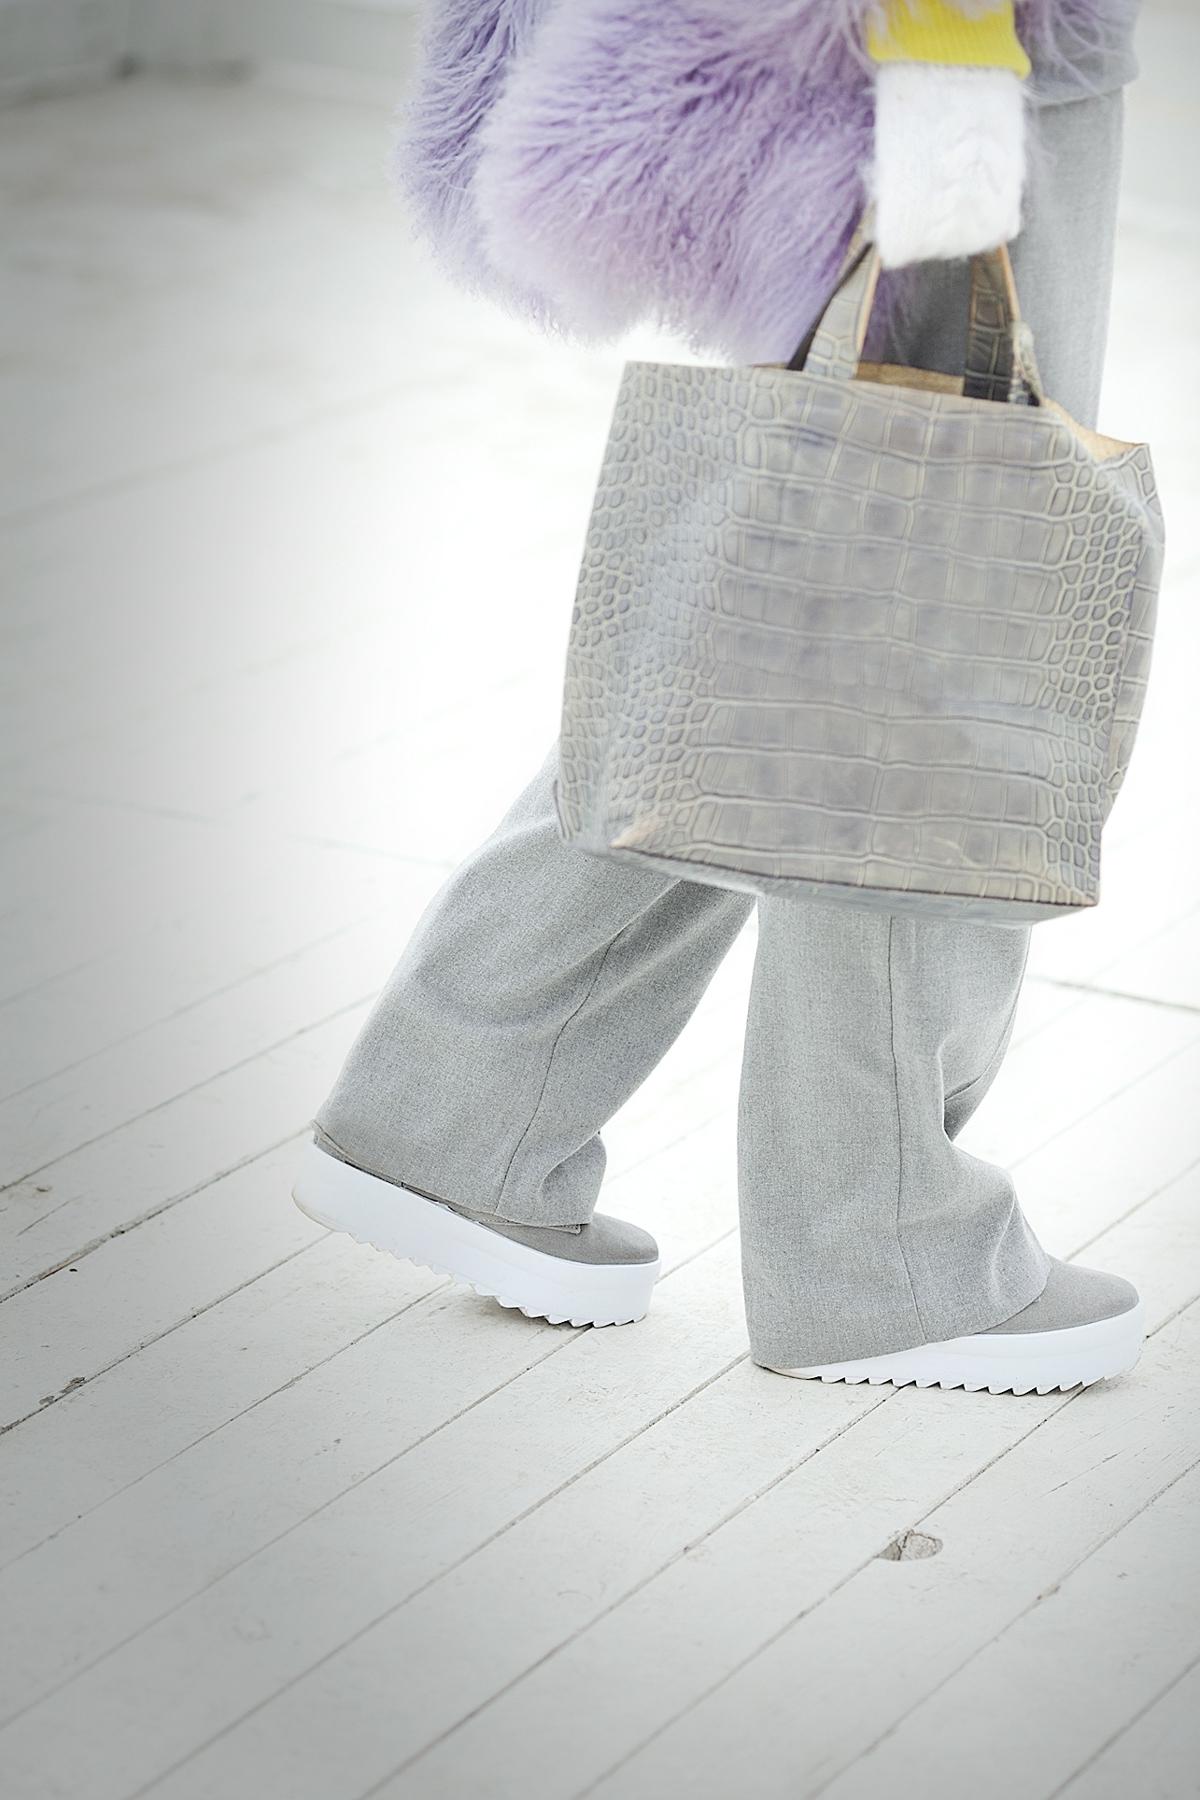 fashion blog GalantGirl